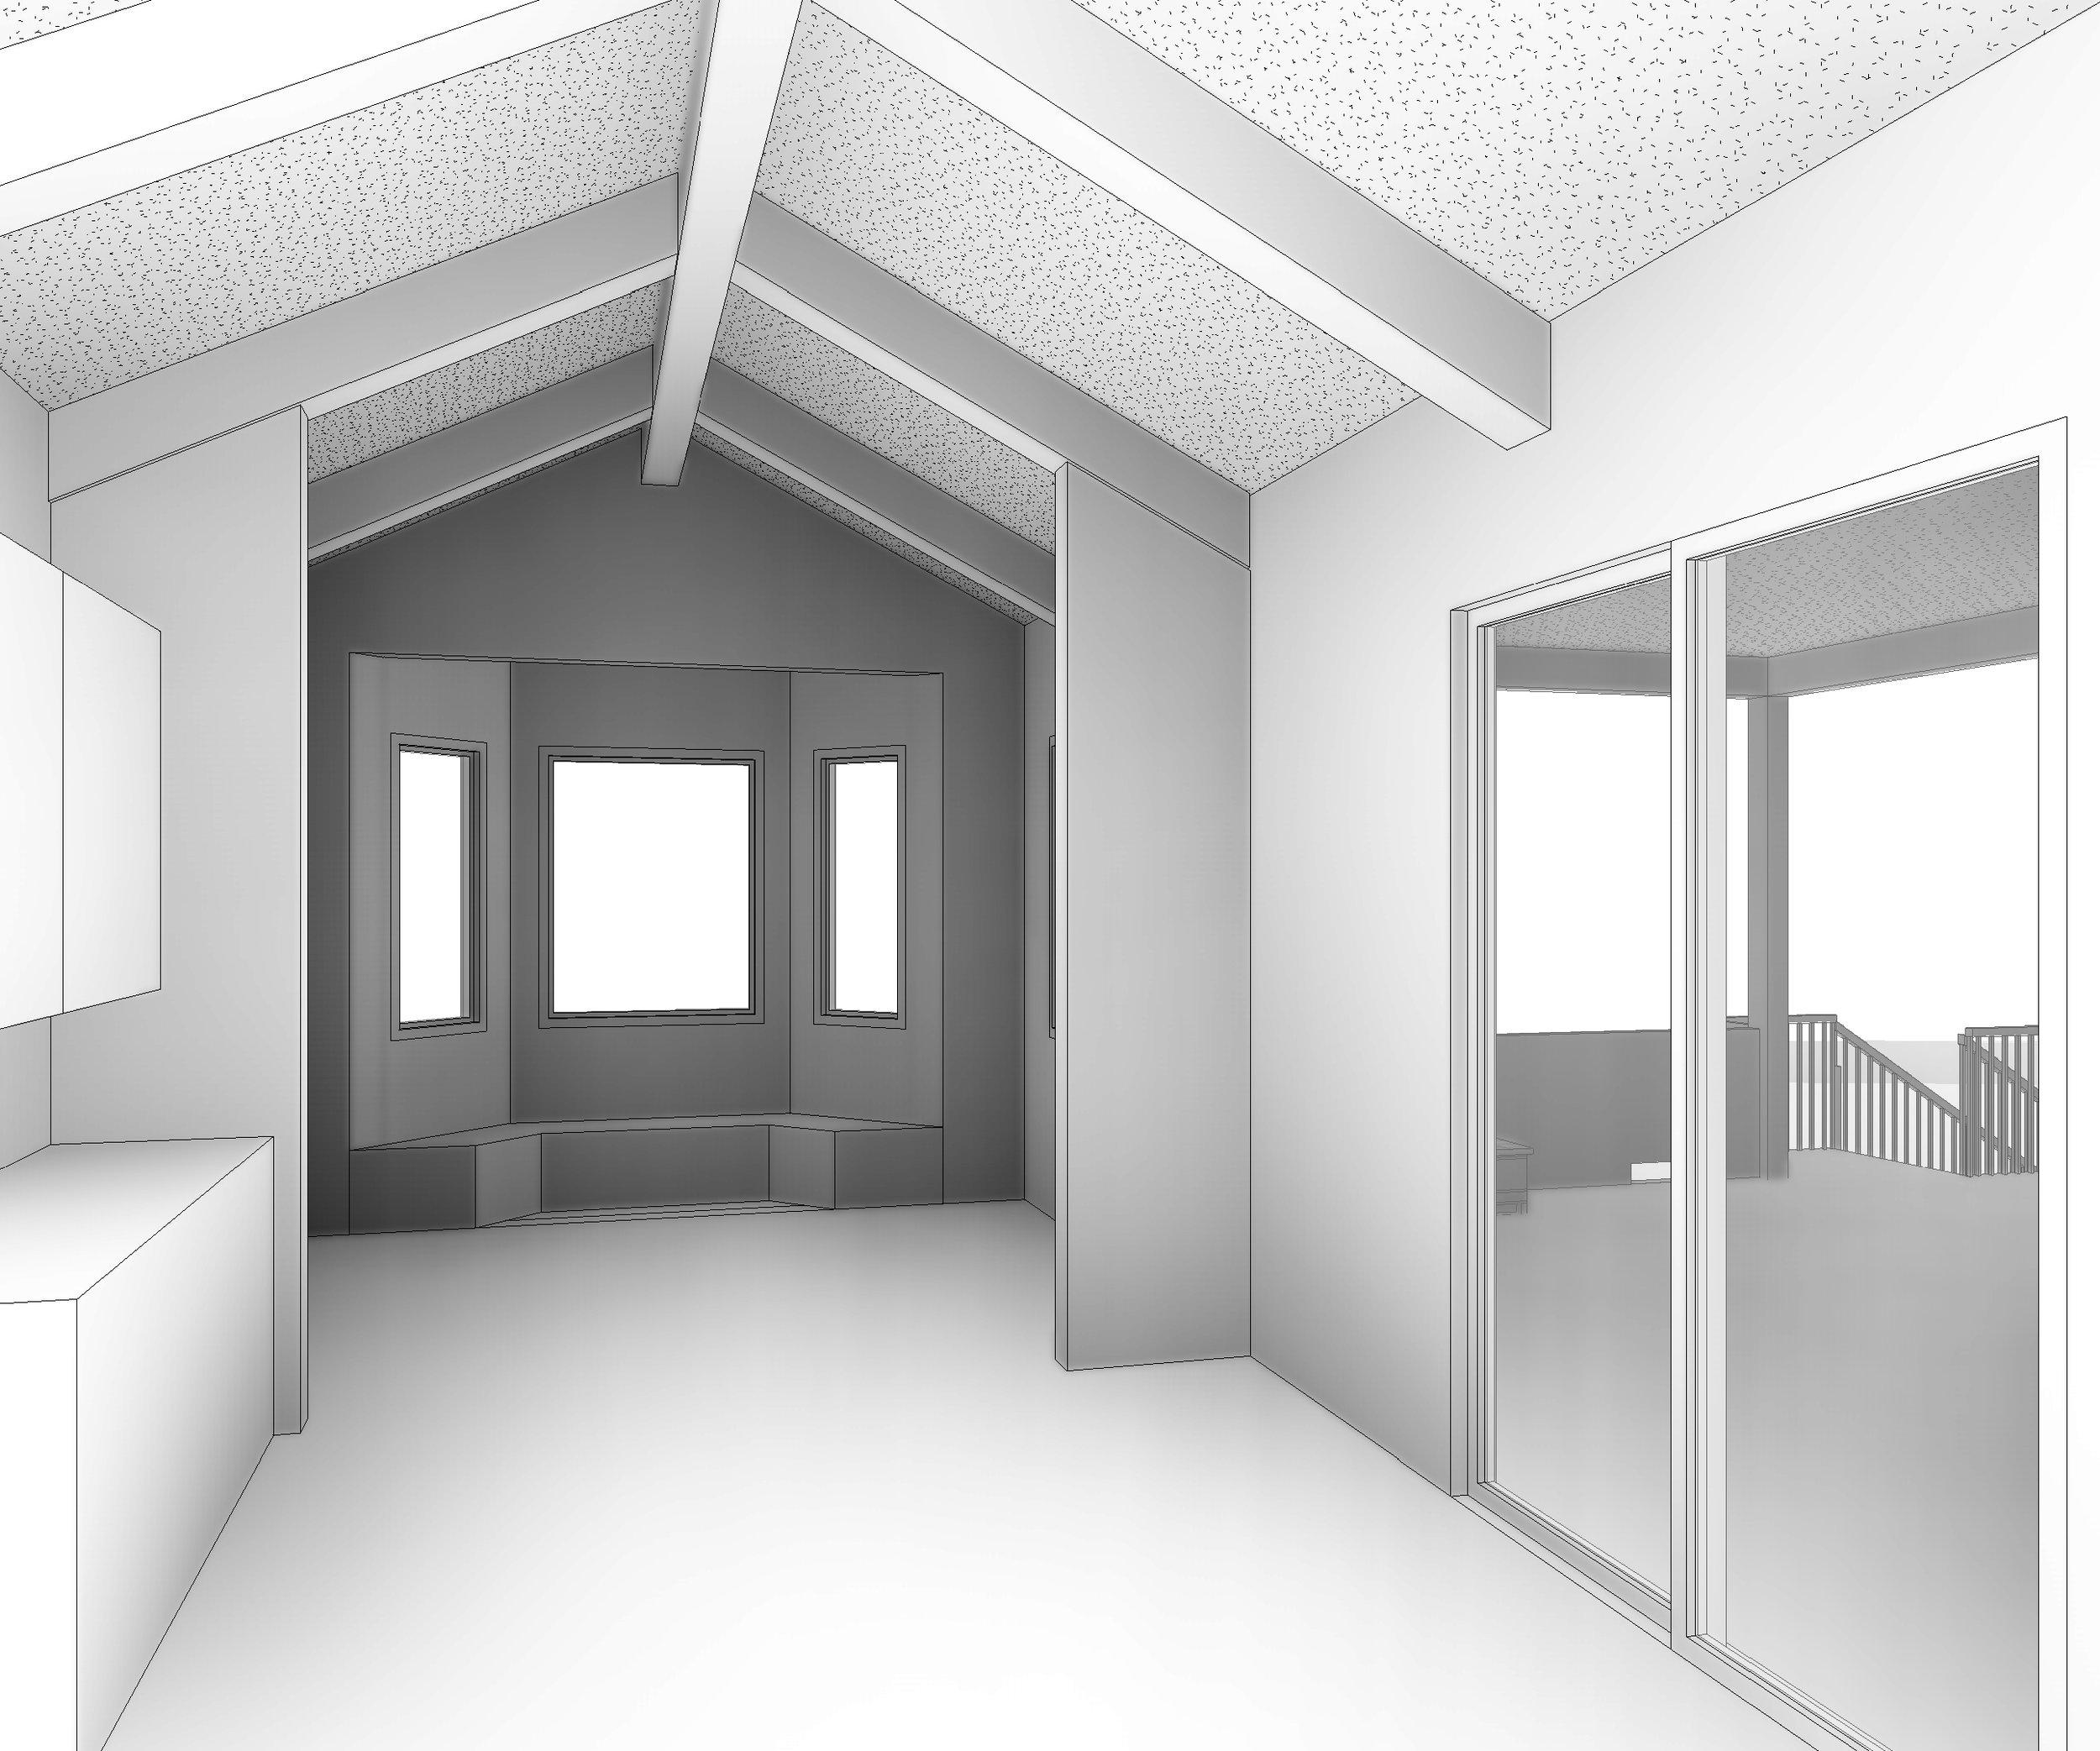 Sanchez Residence_21 - 3D View - BRKFST - STUDY 2.jpg